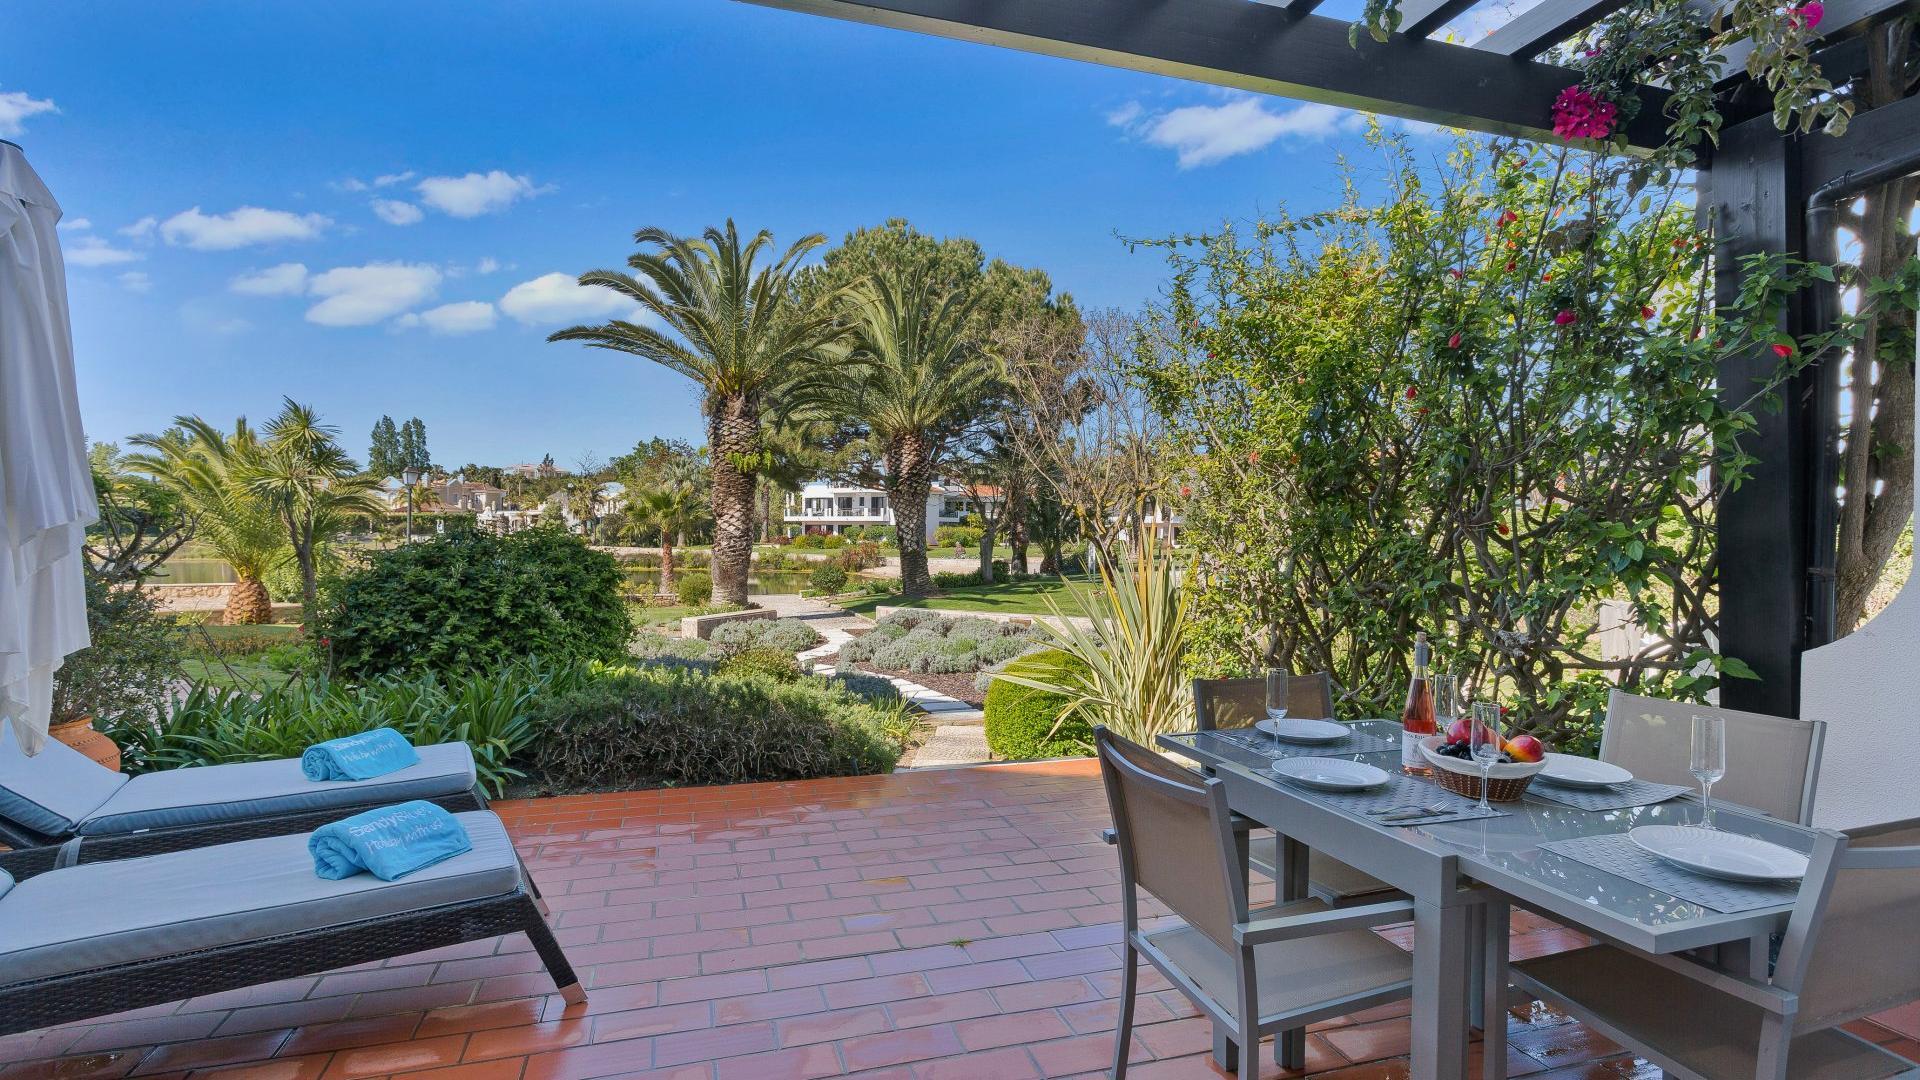 Lakeside Garden Apartment - Lakeside Village, Quinta do Lago, Algarve - 2.jpg